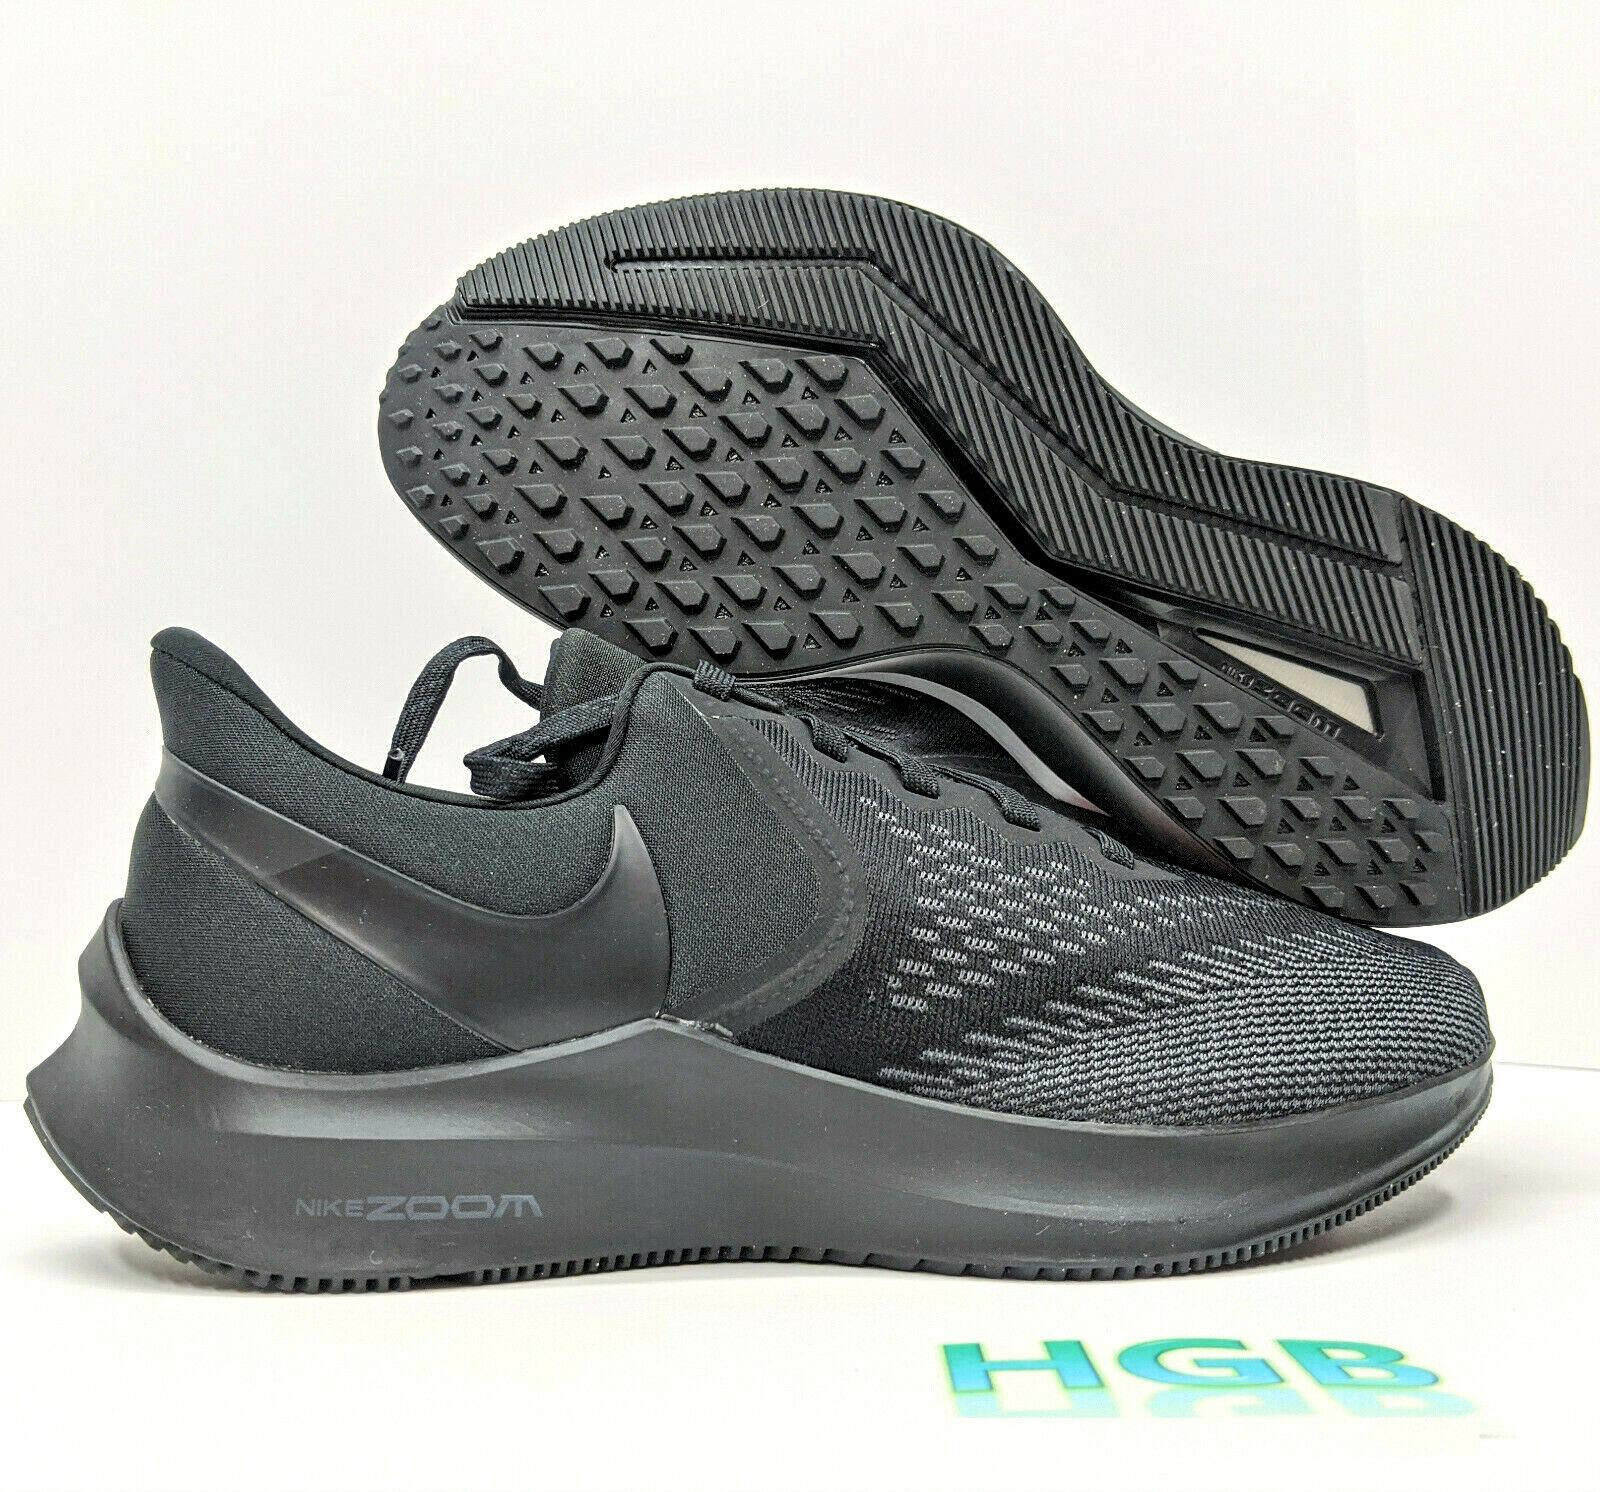 Nike Zoom Winflo 6 4E Wide Mens Running